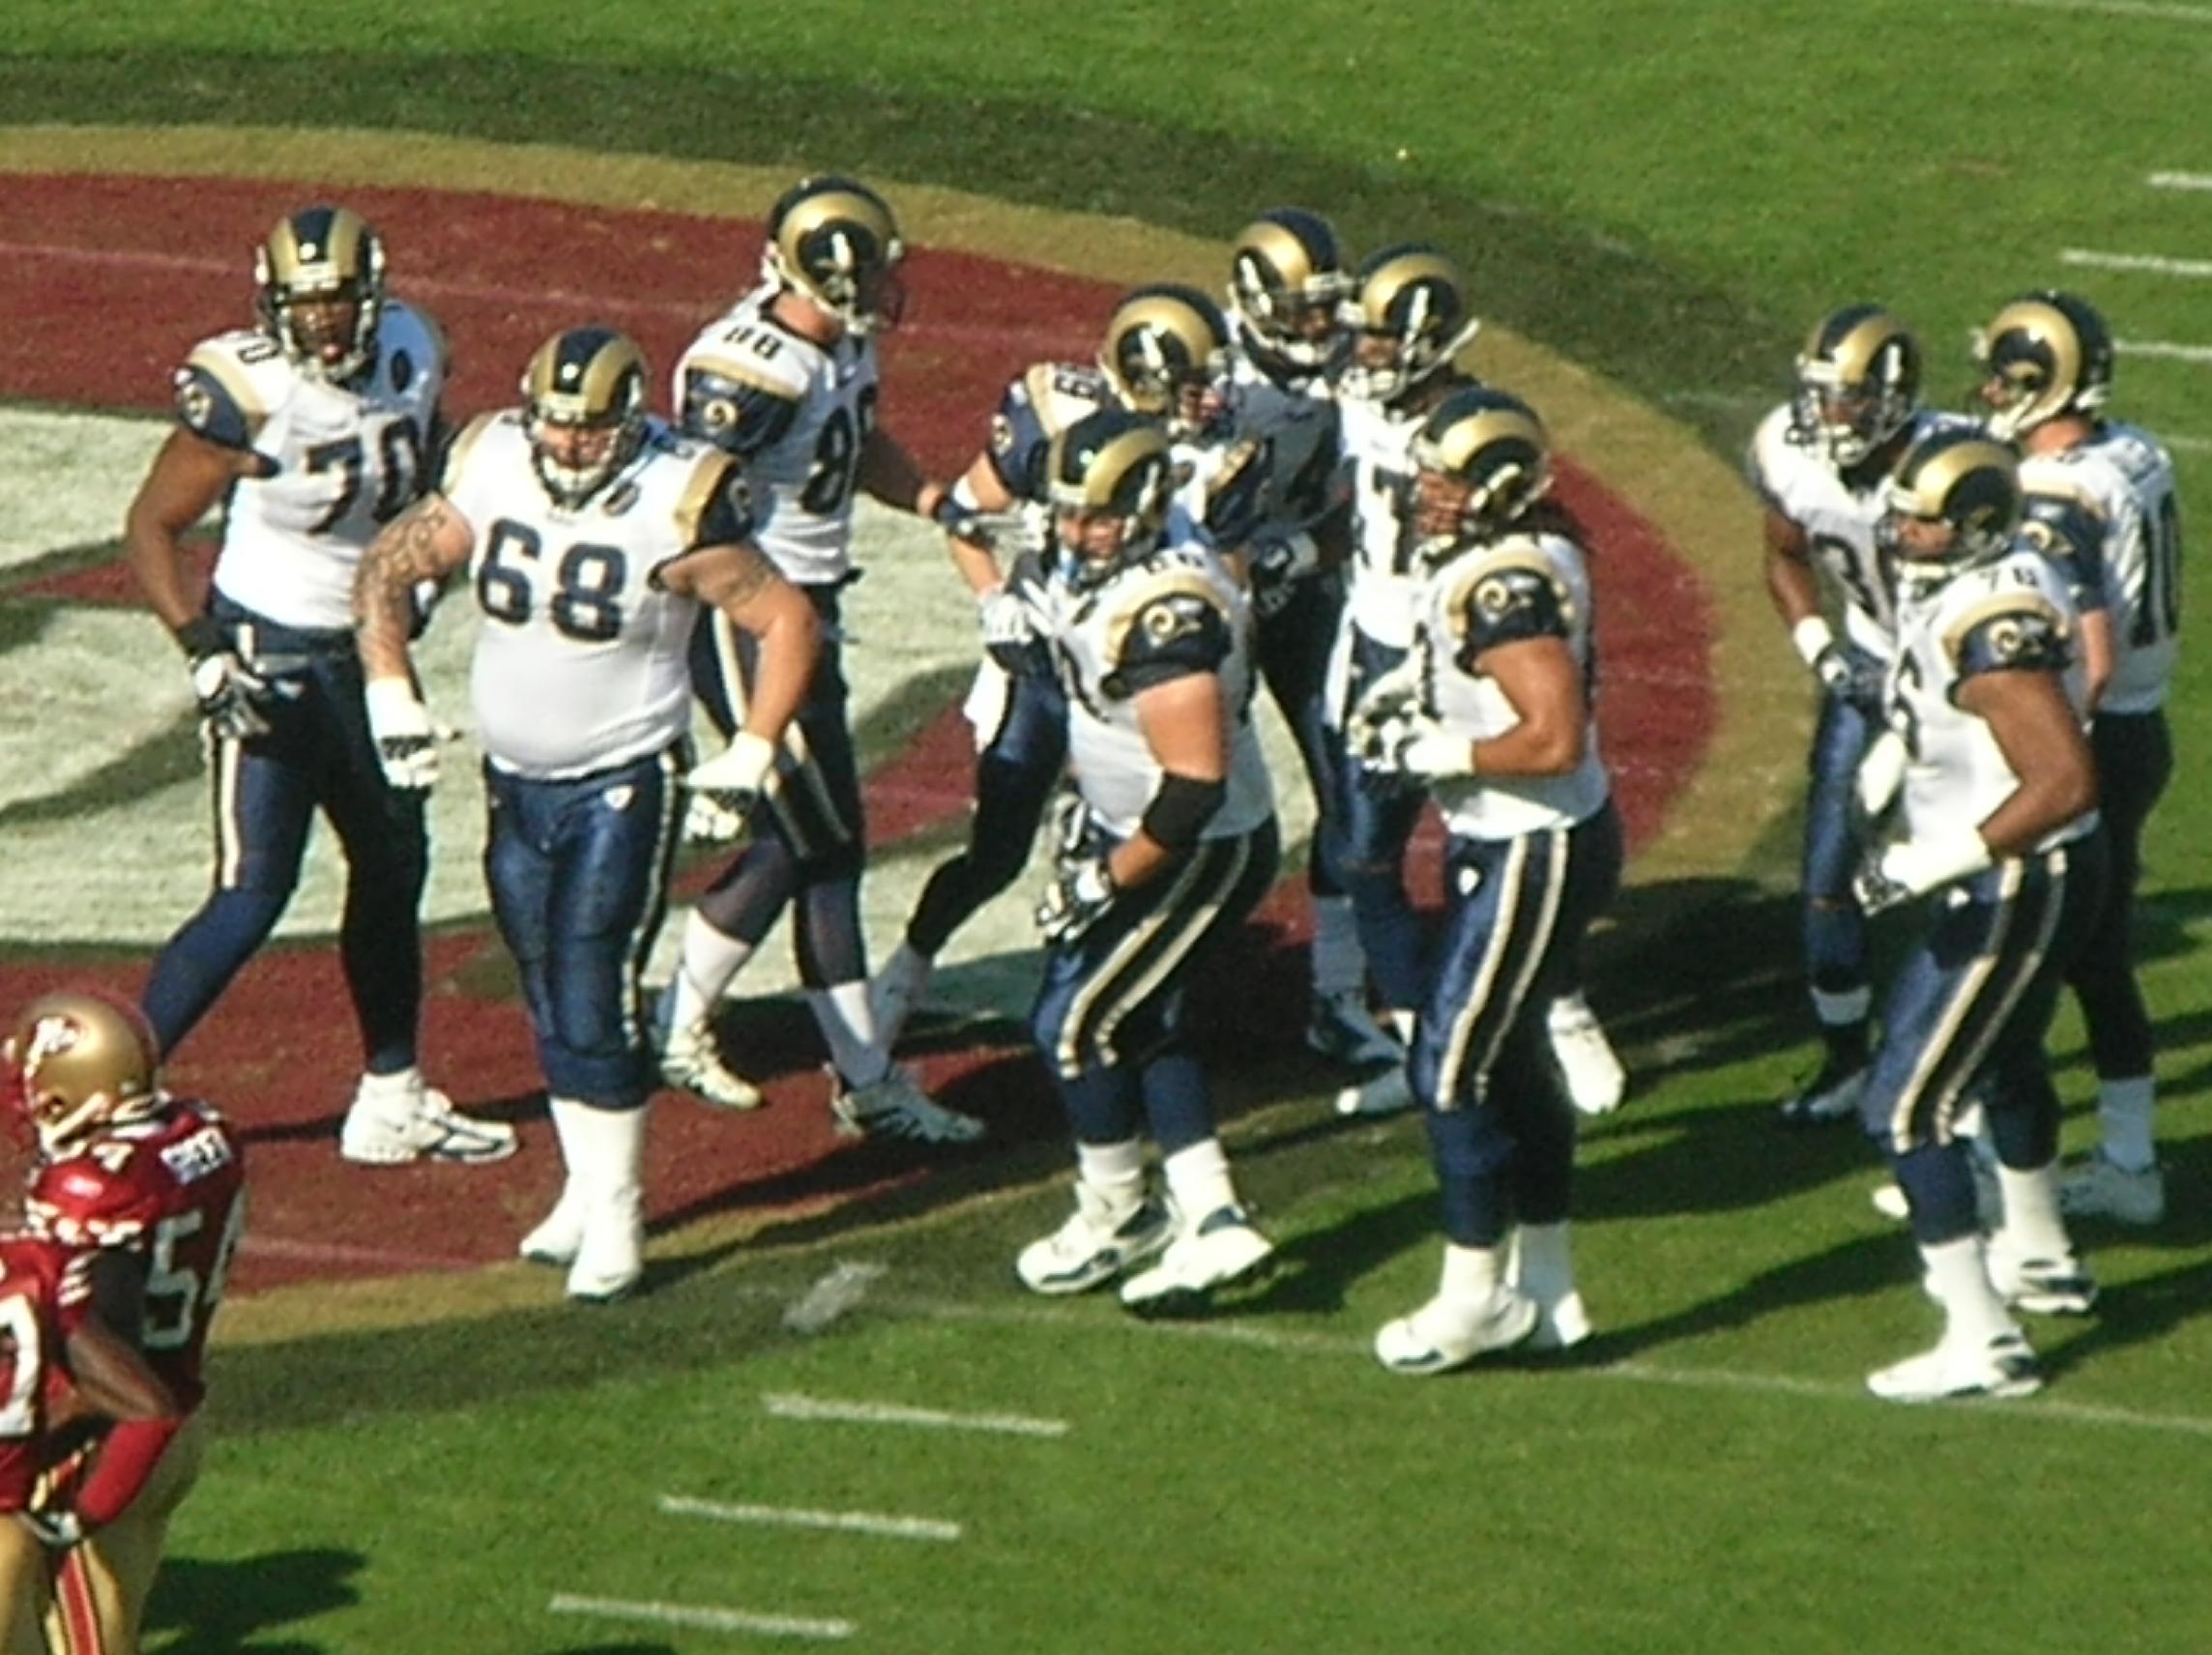 File:Rams break huddle at St. Louis at SF 11-16-08.JPG - Wikimedia ...